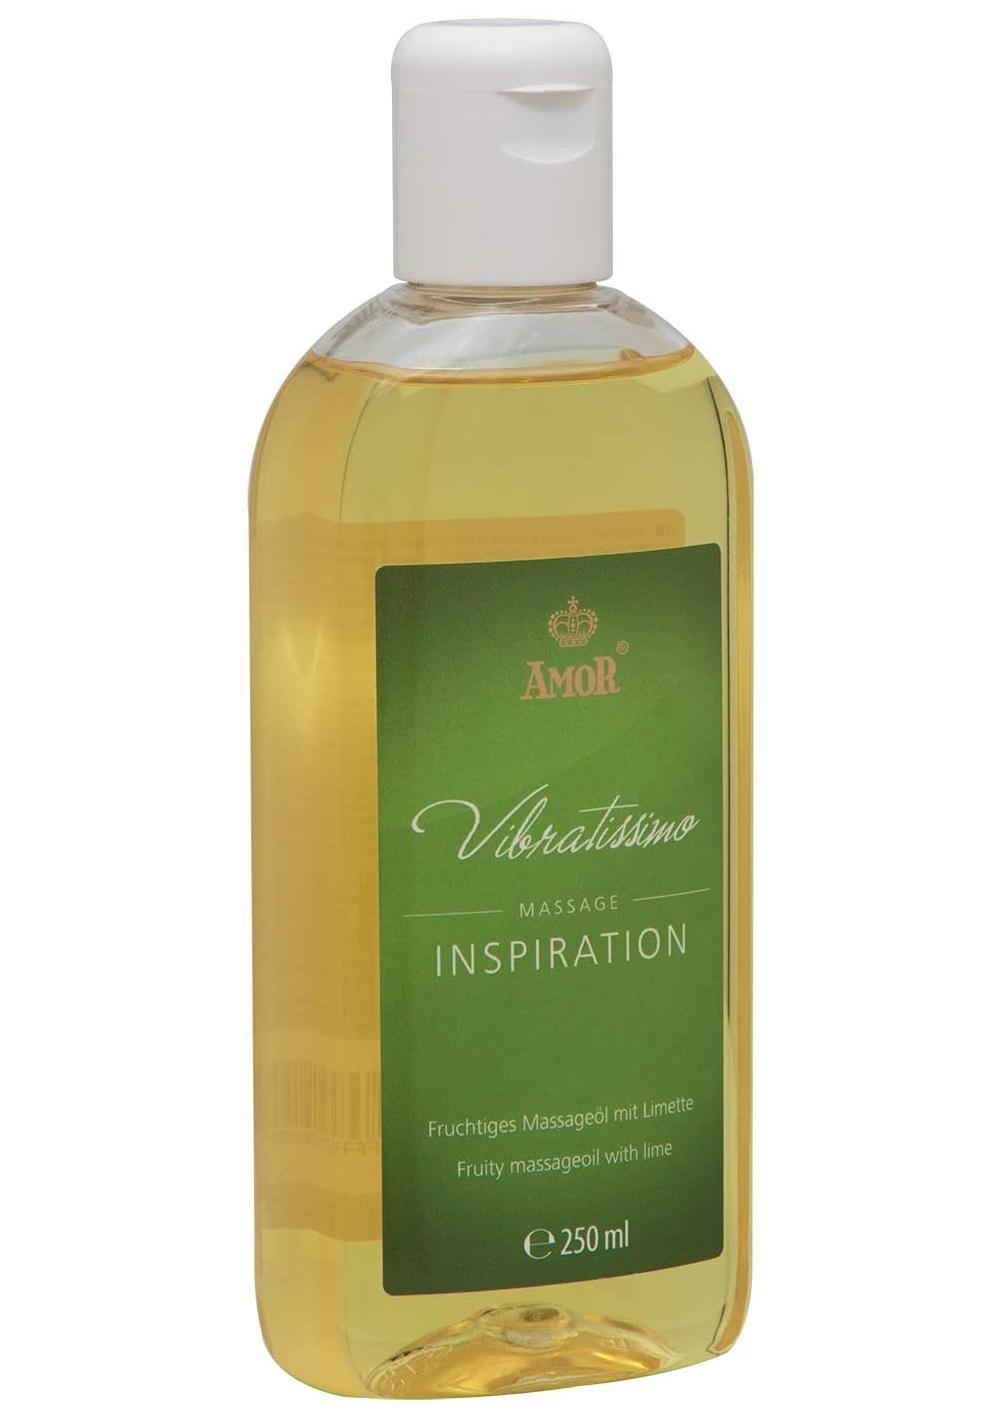 Vibratissimo Exotic massageoil INSPIRATION-250ml.